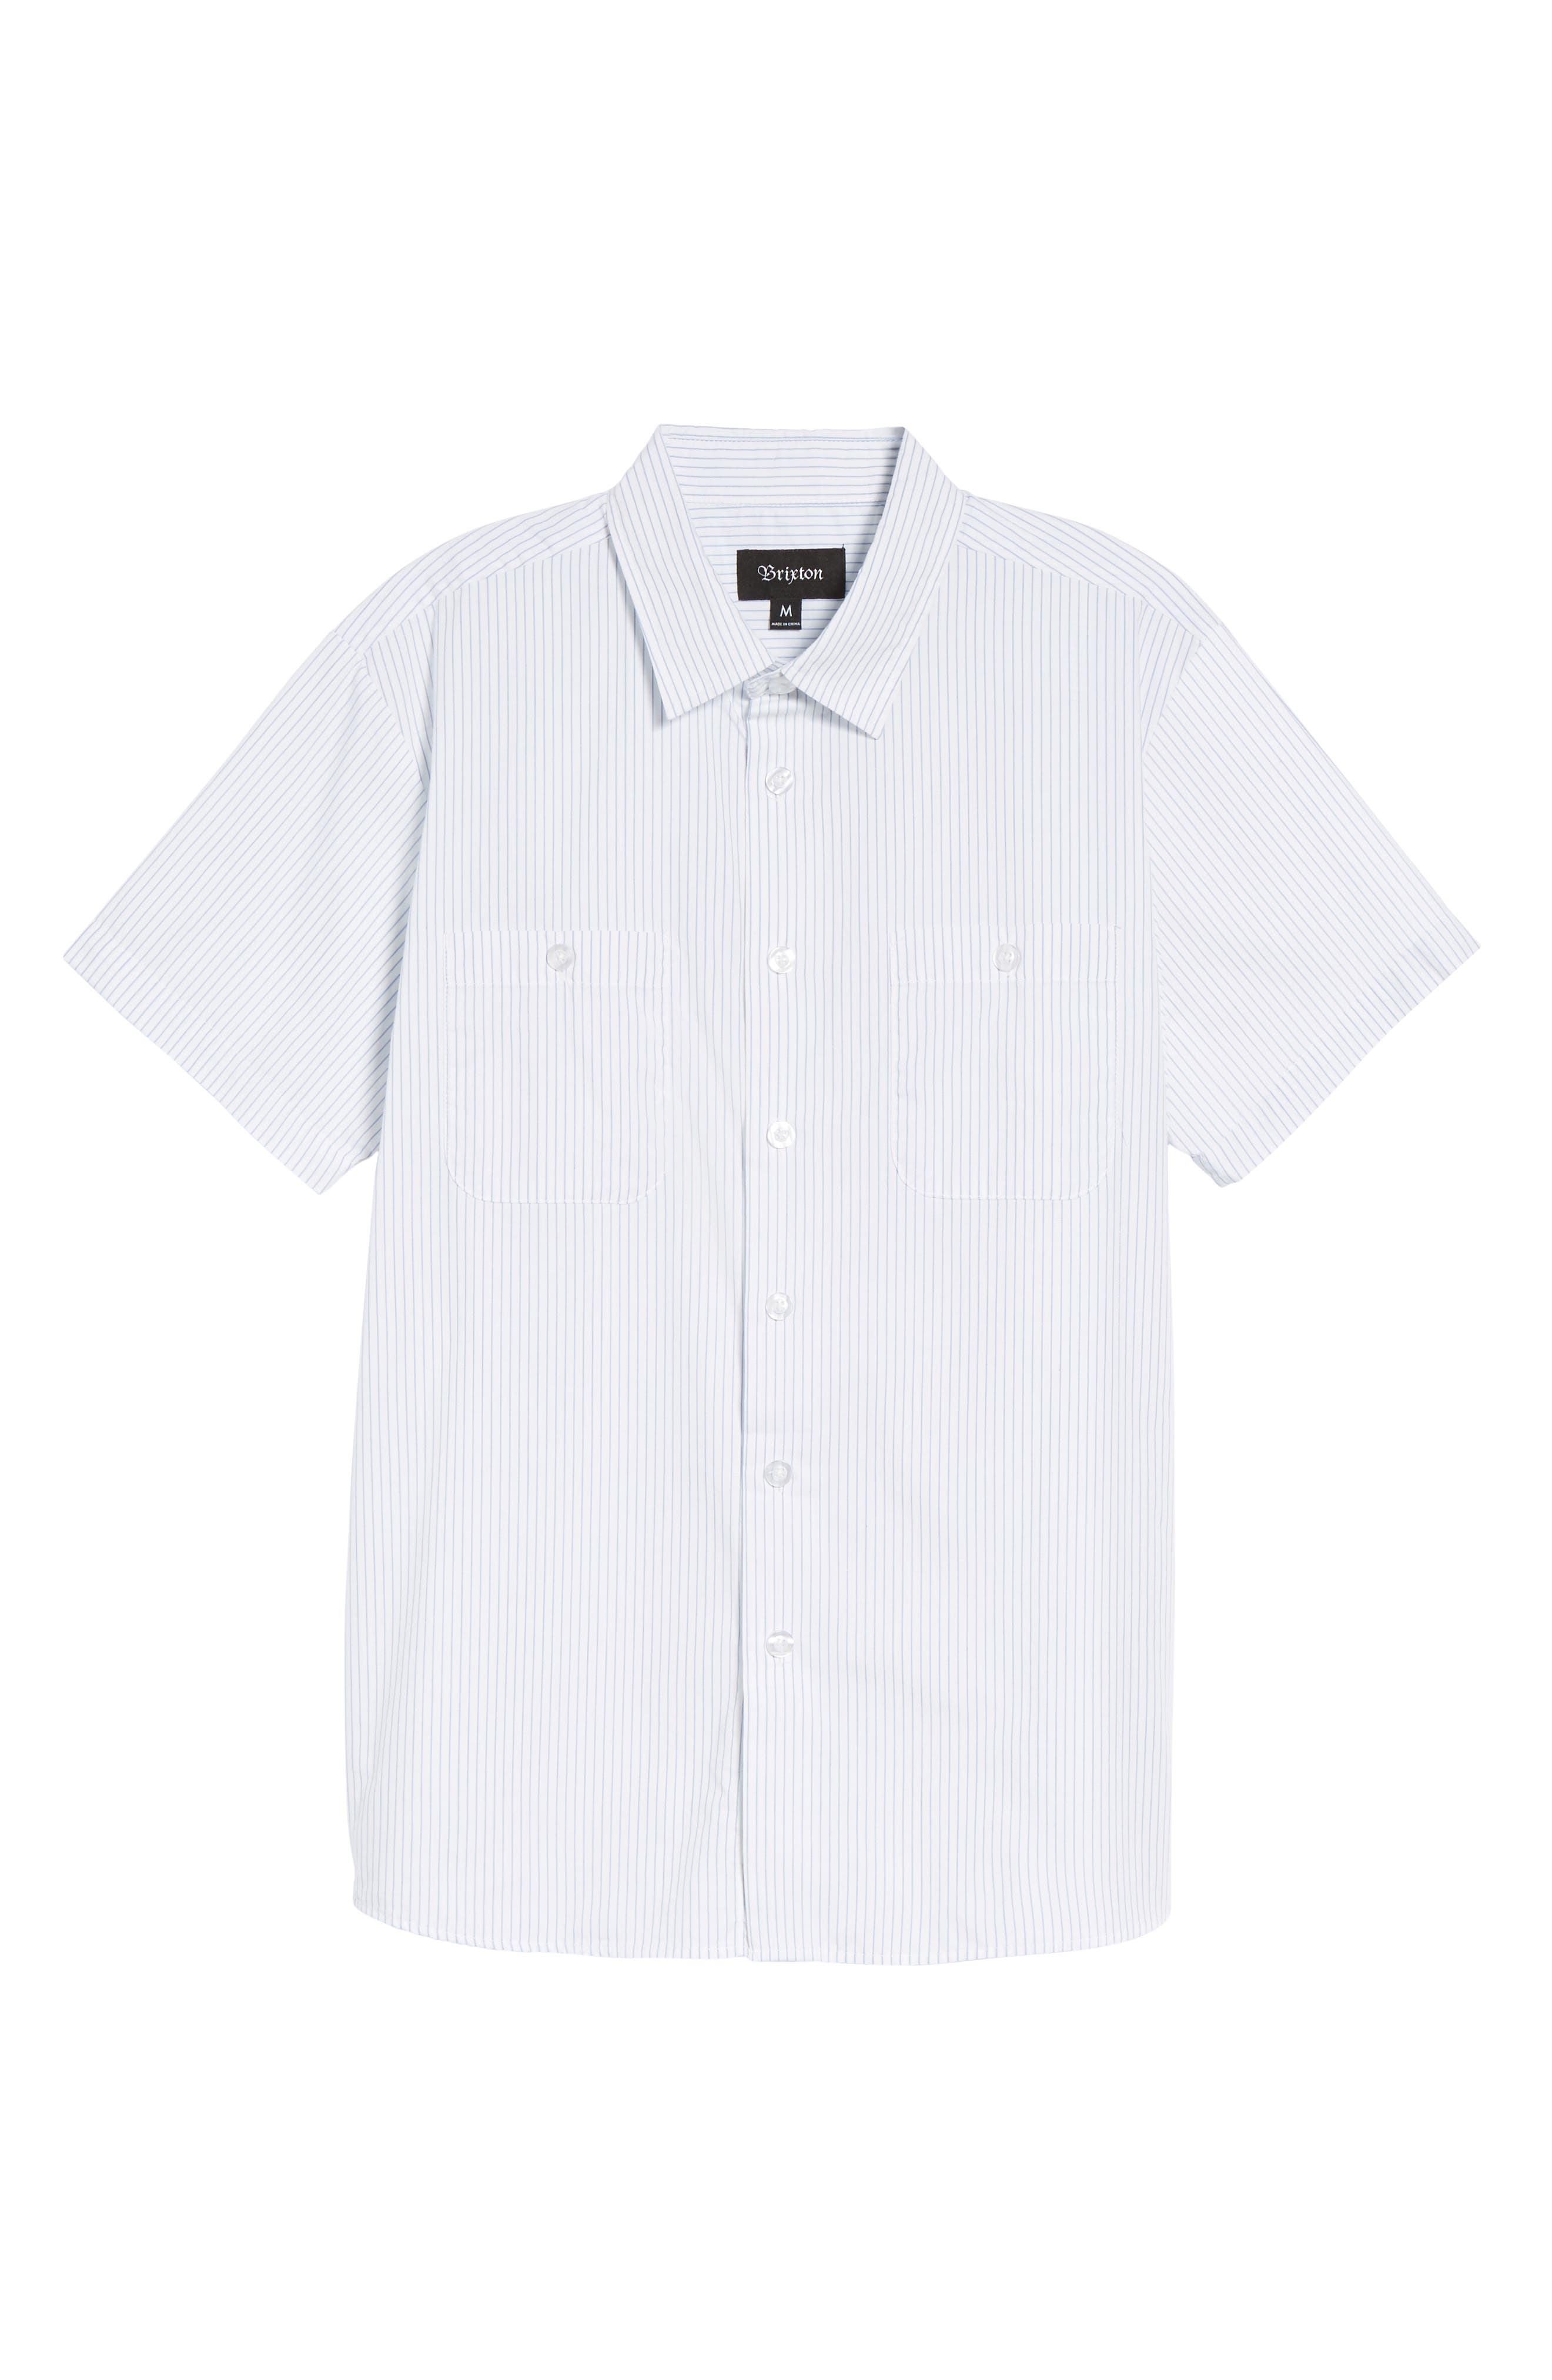 Reeve Pinstripe Woven Shirt,                             Alternate thumbnail 6, color,                             100